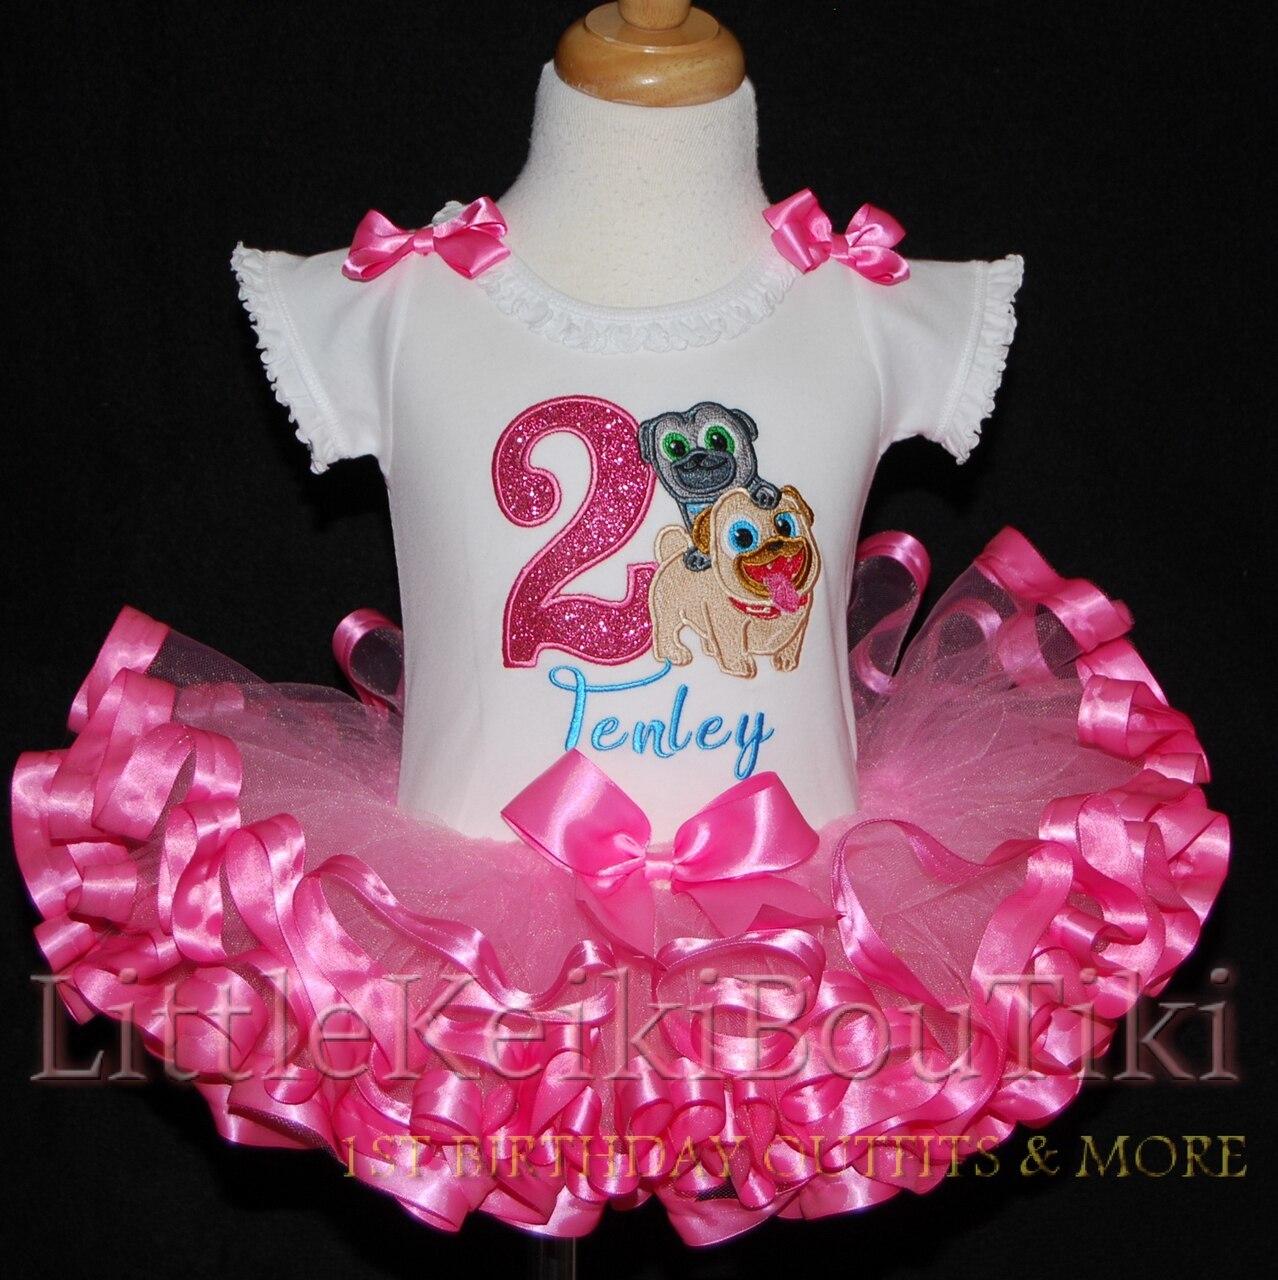 Puppy Dog Pals-2nd birthday girl outfit, Tutu birthday dress